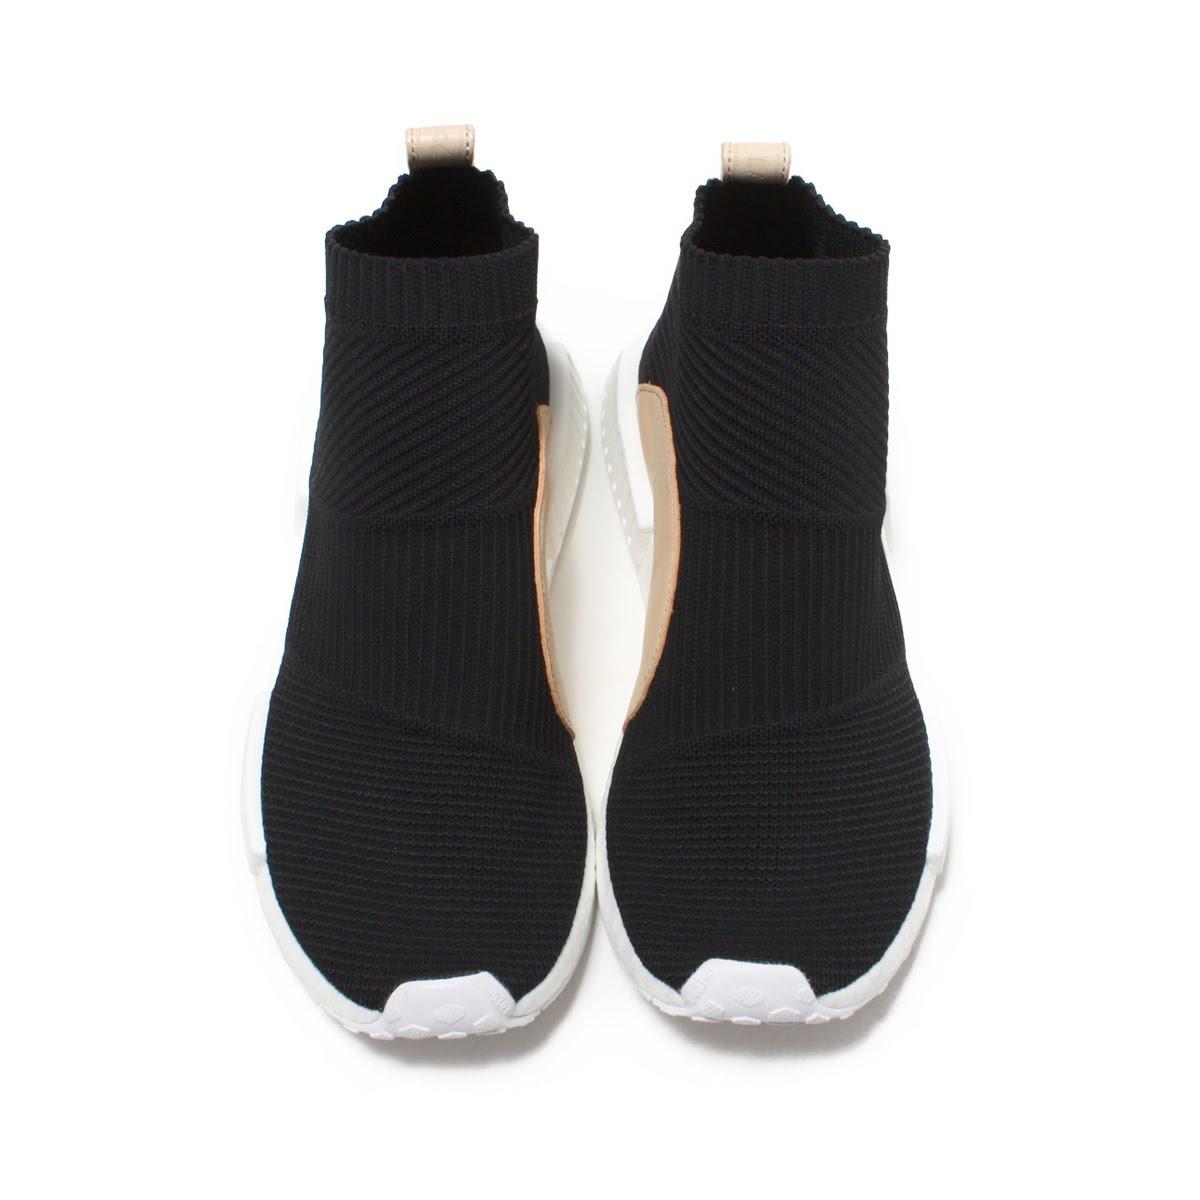 f8f344182 adidas Originals NMD CS1 PK (Adidas originals N M D CS1 PK) CORE BLUE CORE  BLACK RUNNING WHITE 18FW-I